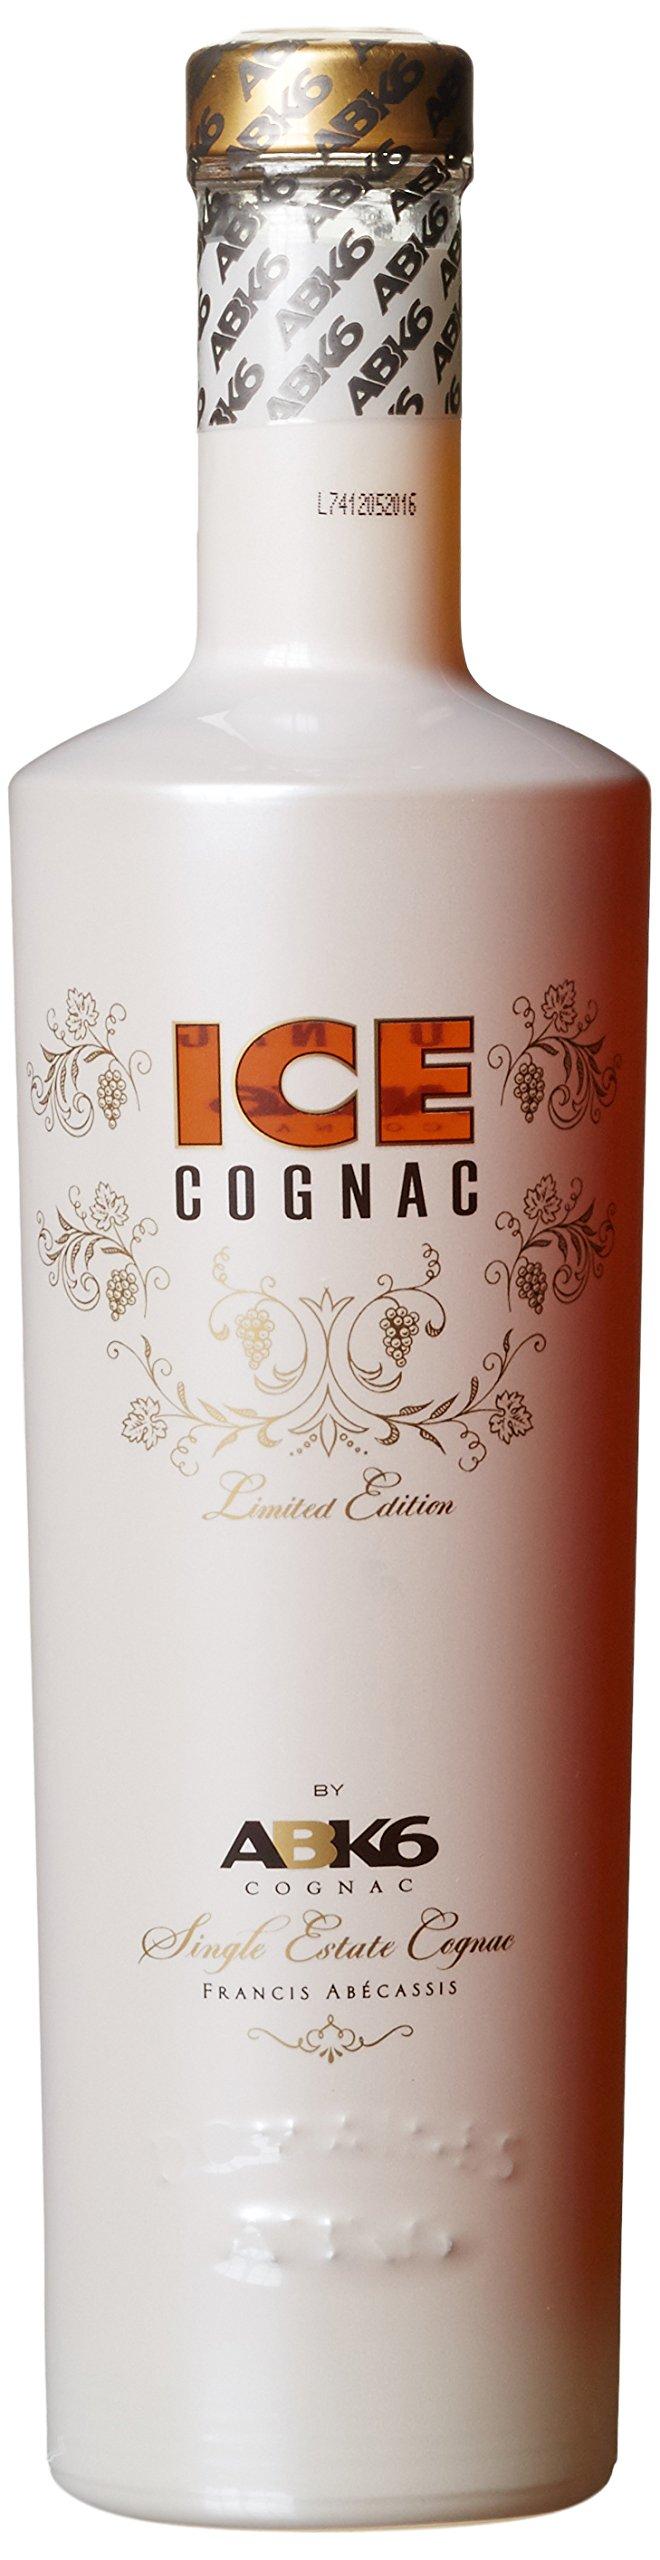 ABK6-Abcassis-Cognac-ICE-1-x-07-l